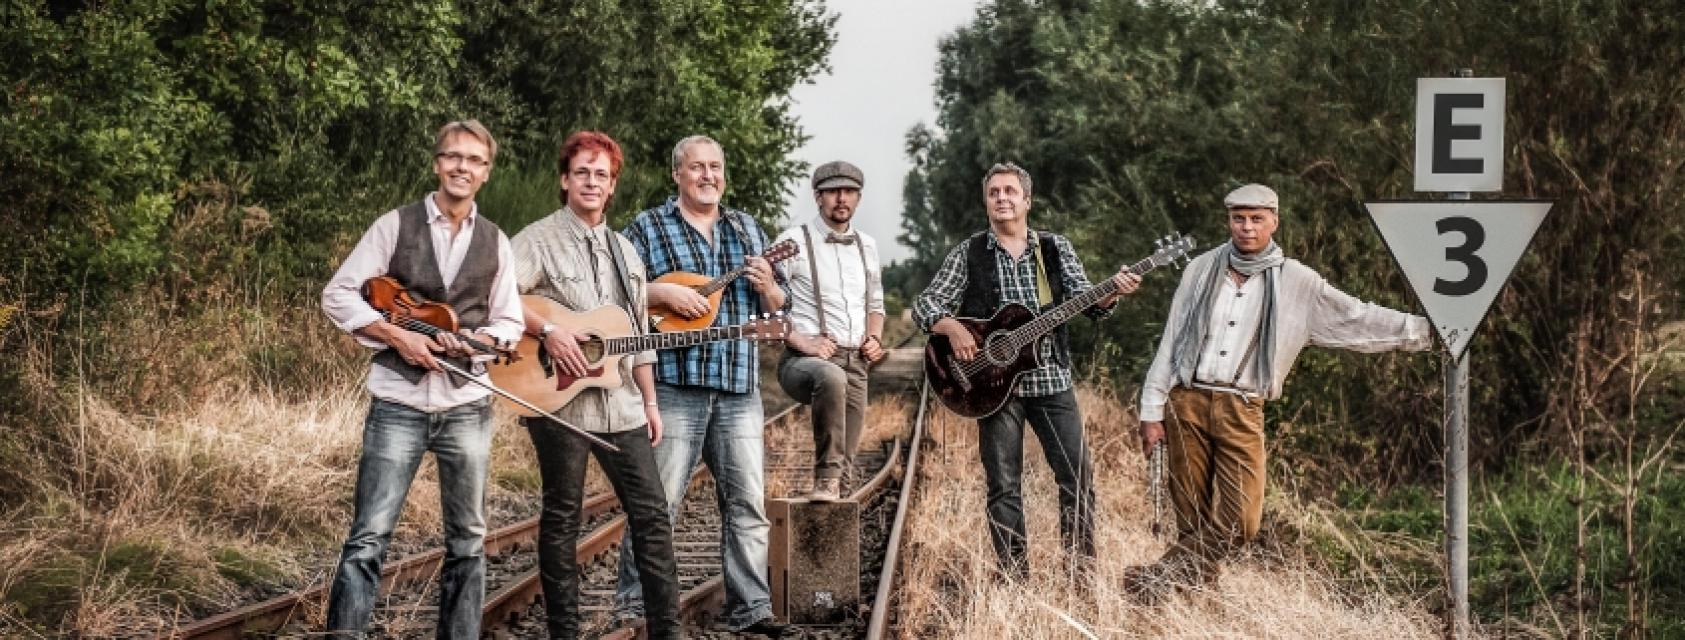 E3 Acoustic Band – 25-jähriges Bandjubiläum